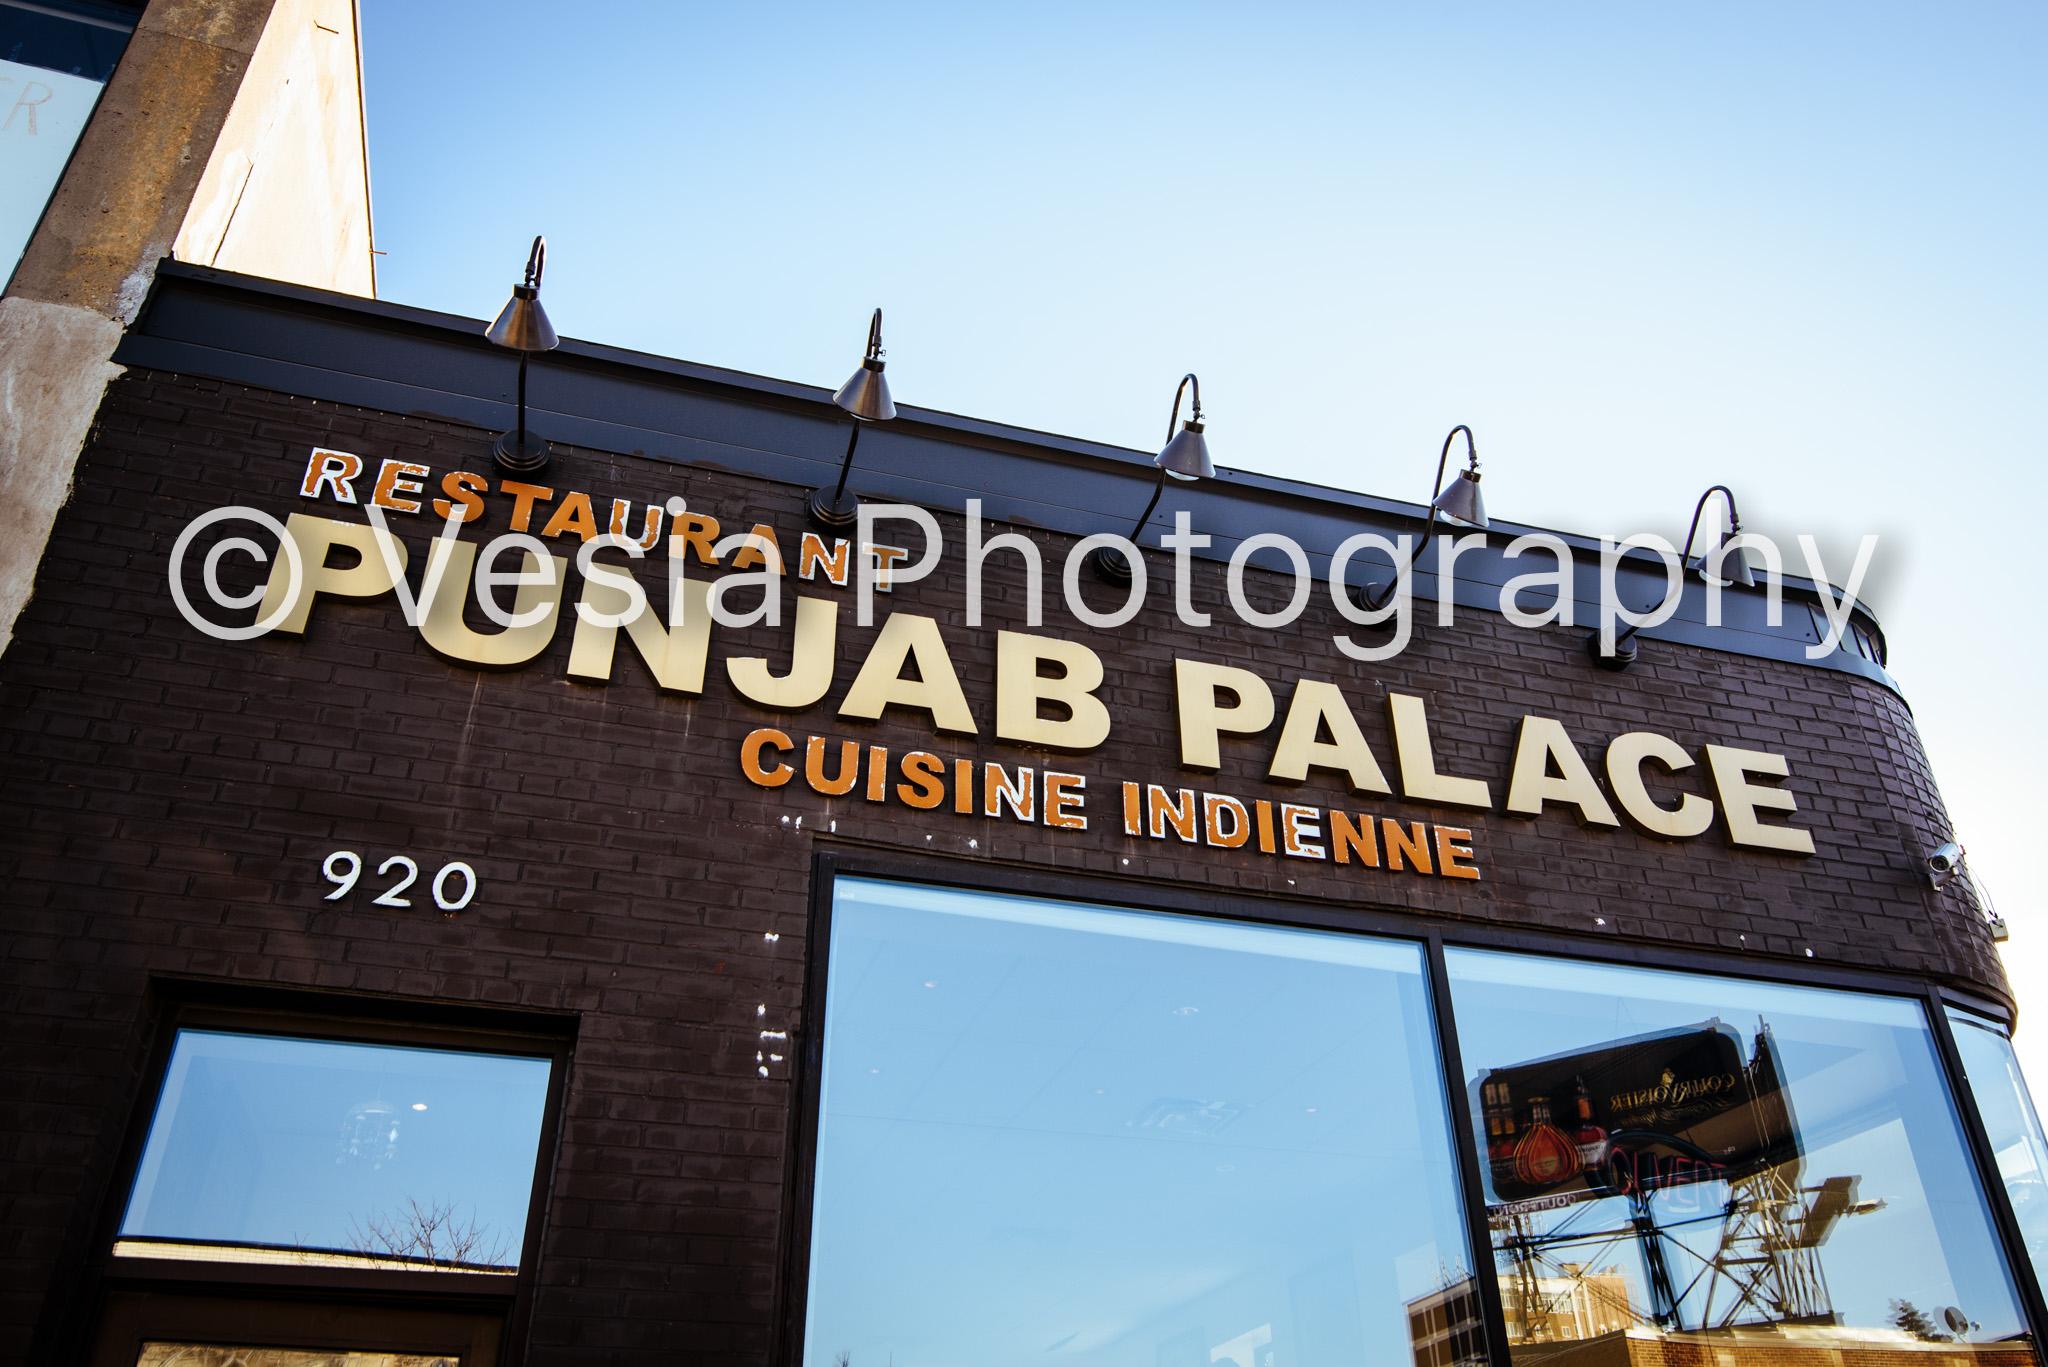 Punjab Palace_Proofs-3.jpg